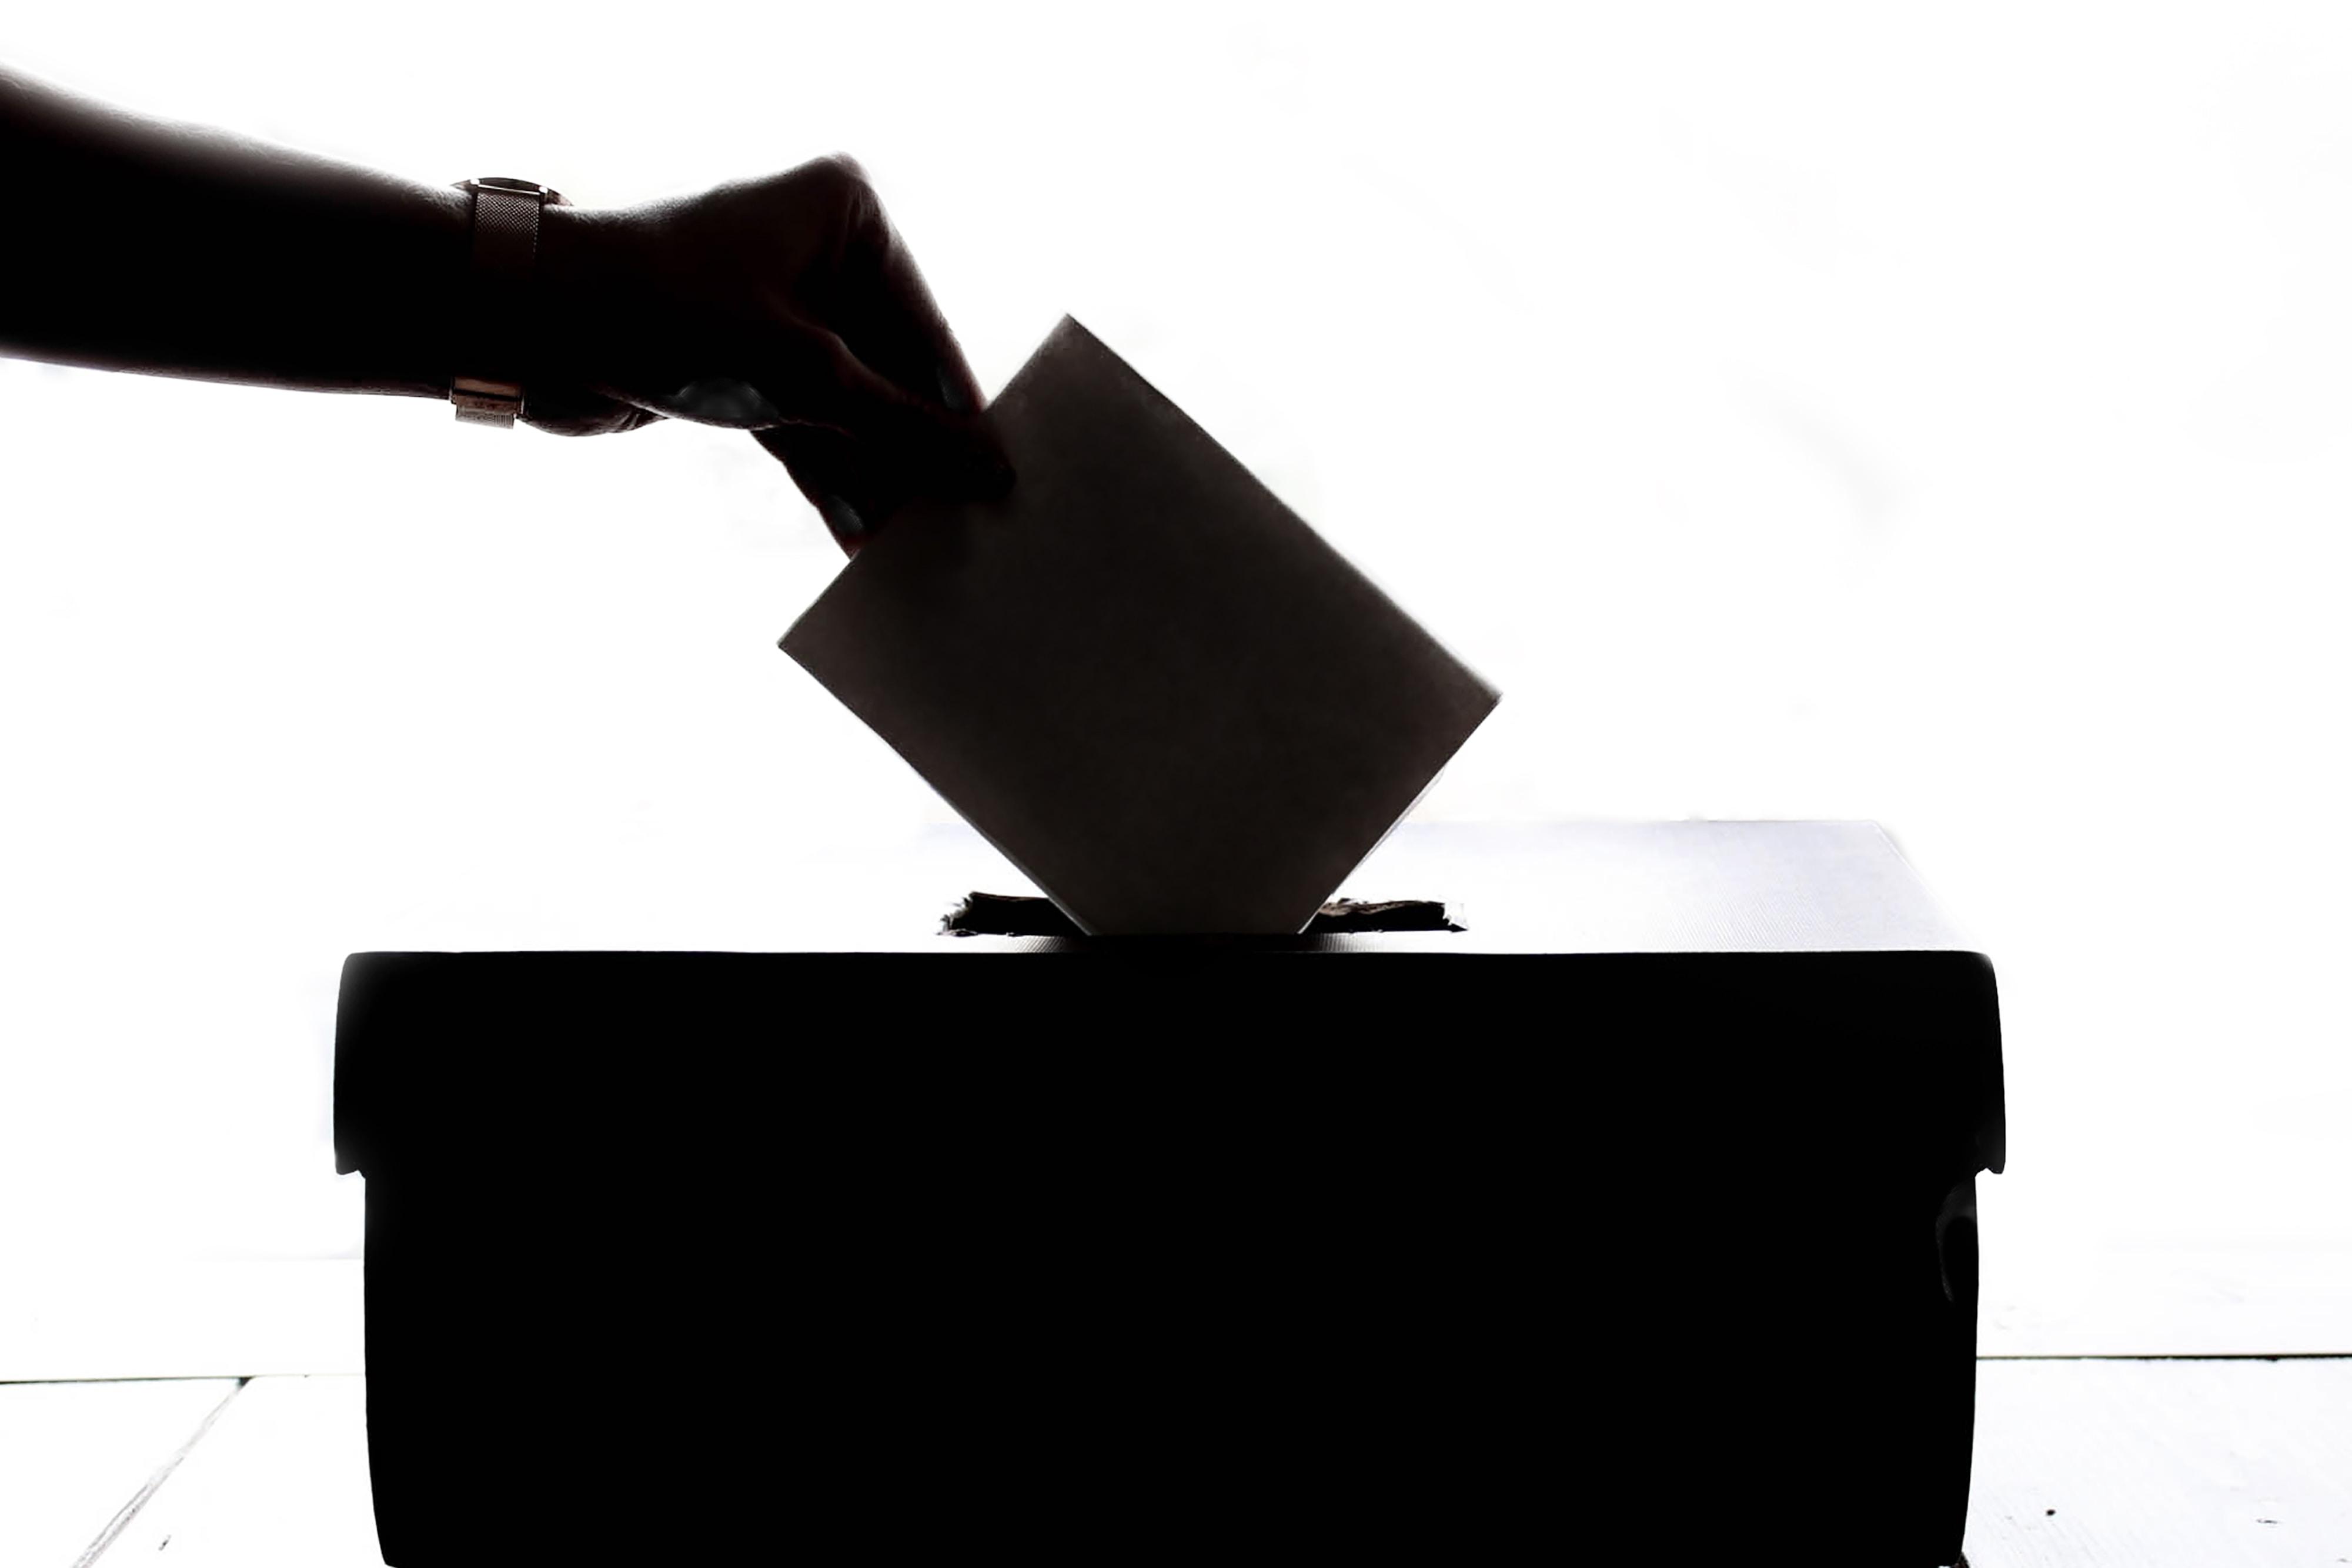 file/ELEMENTO_NEWSLETTER/20224/Elezioni_Voto_element5-digital-T9CXBZLUvic-unsplash.jpg